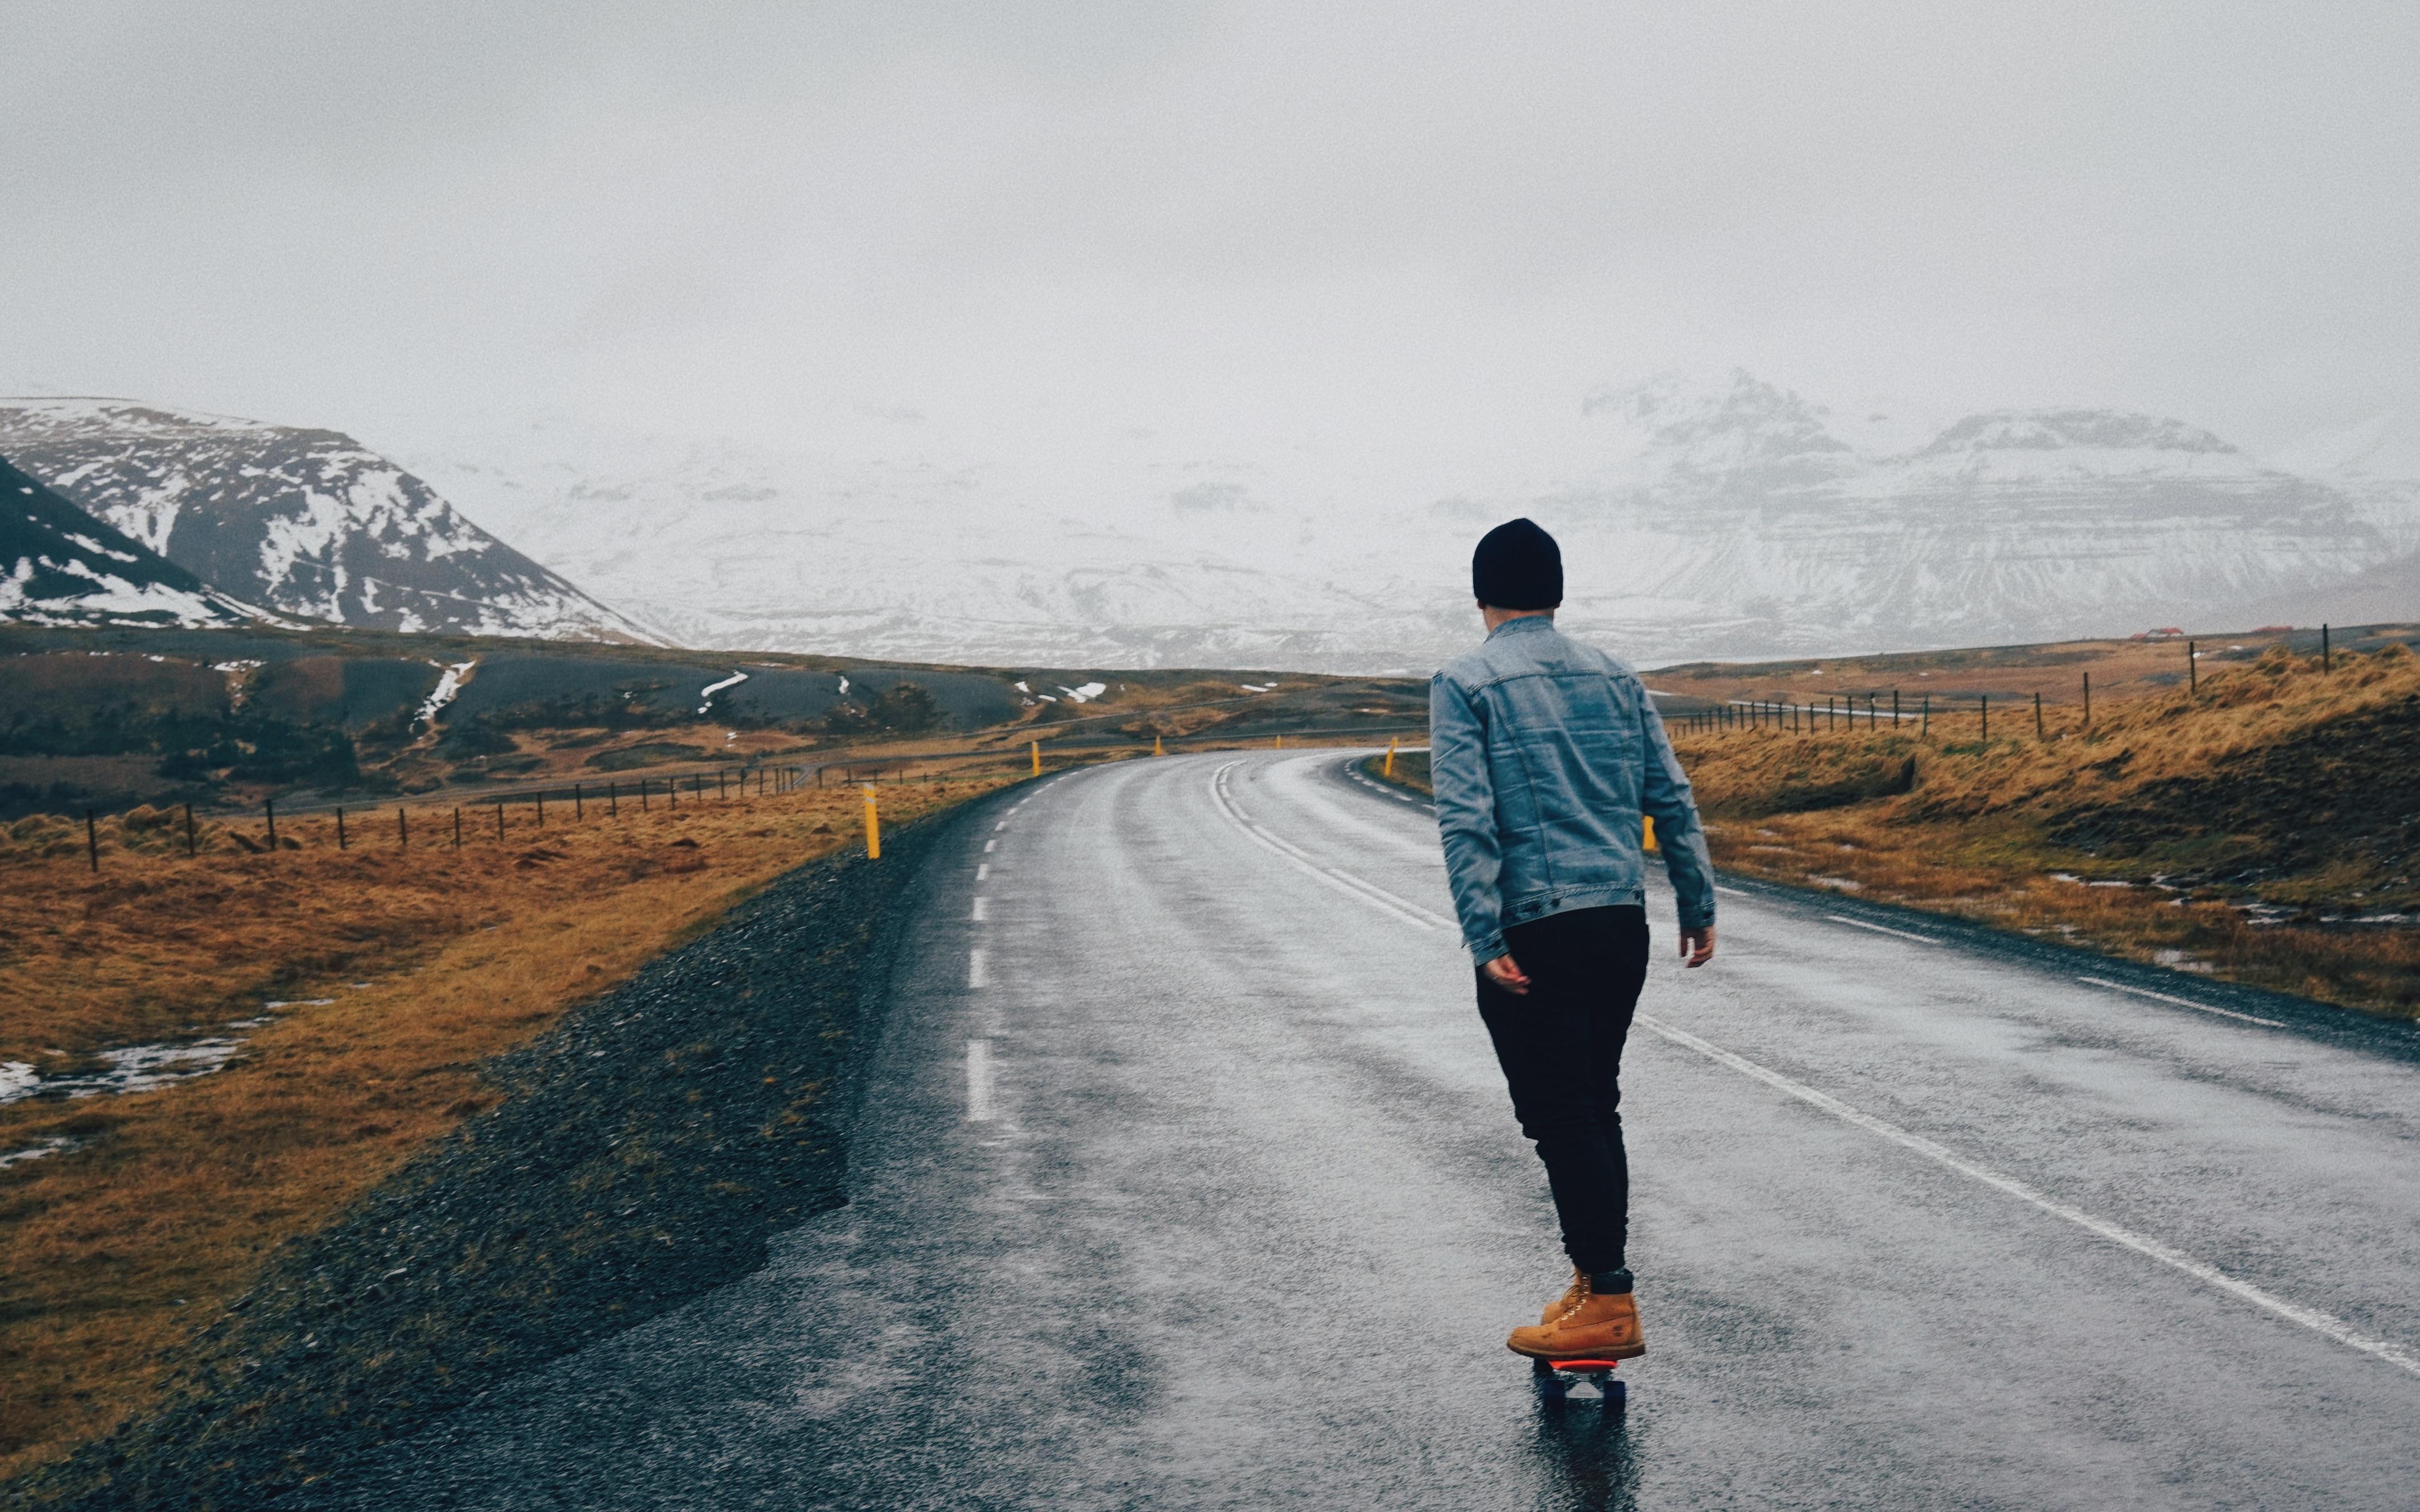 梦想家_《白日梦想家的冰岛之旅》_哔哩哔哩 (゜-゜)つロ 干杯~-bilibili